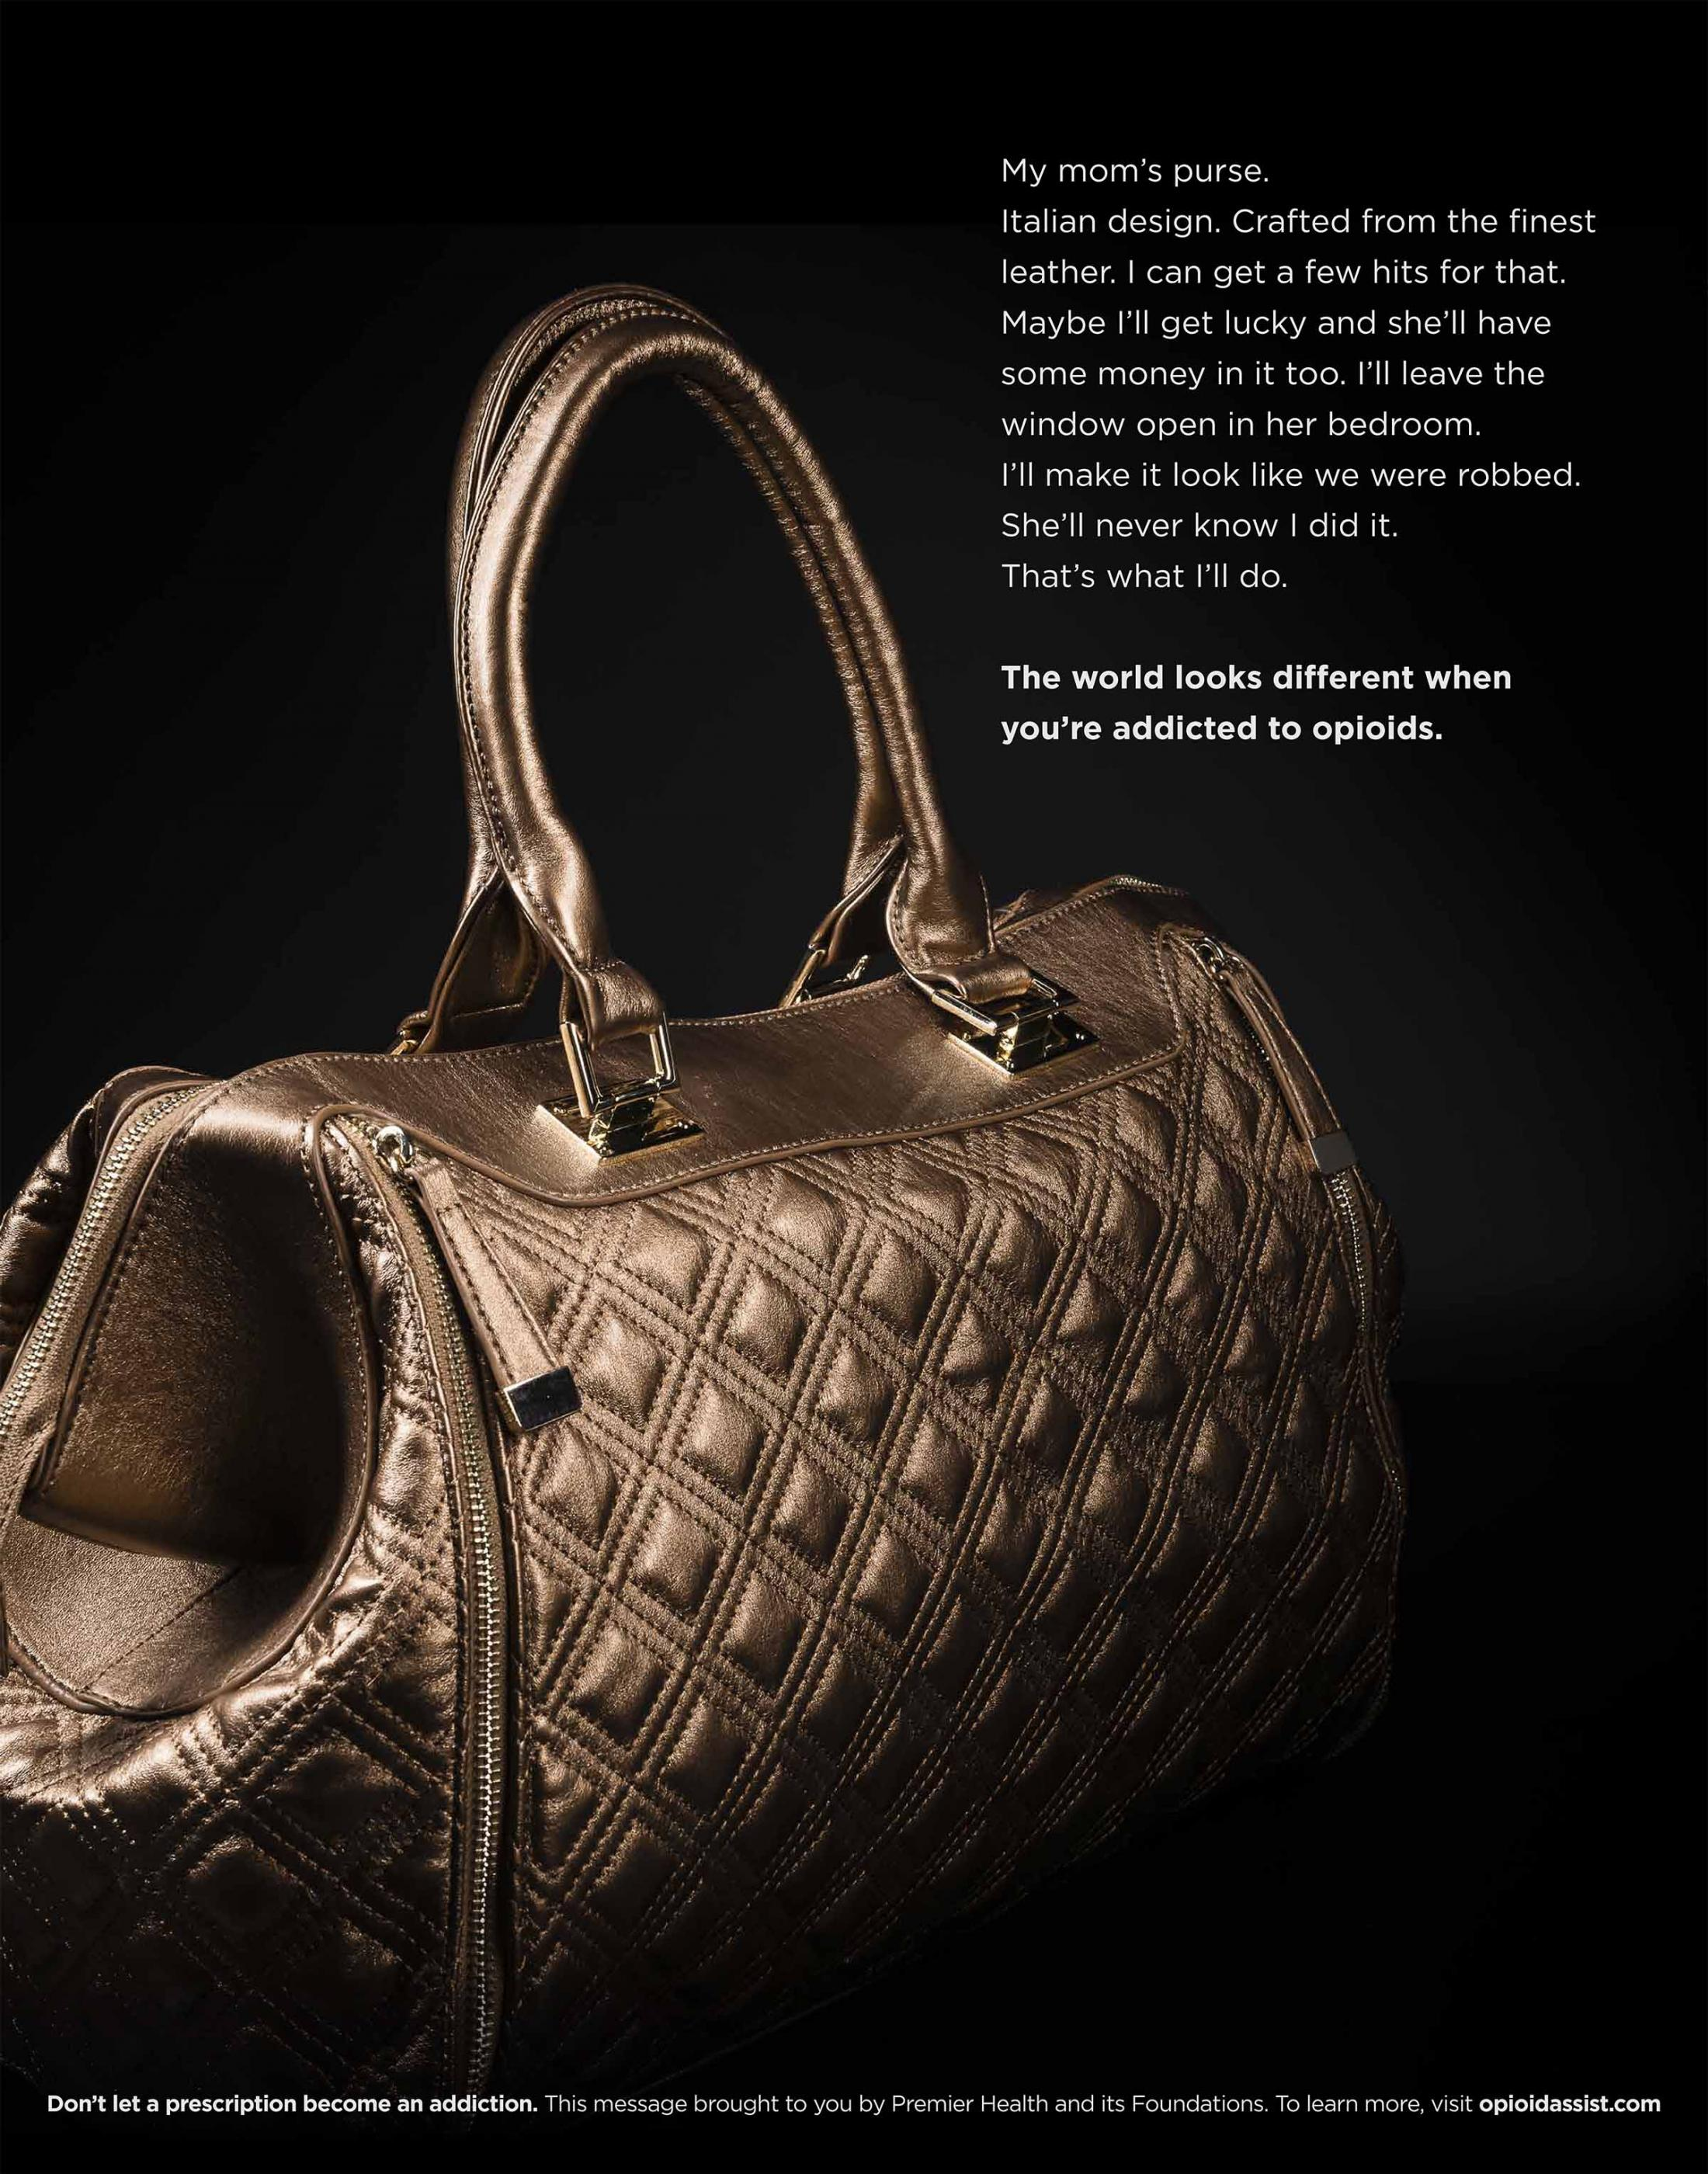 Premier Health Print Ad - Opioid Fashion, 3